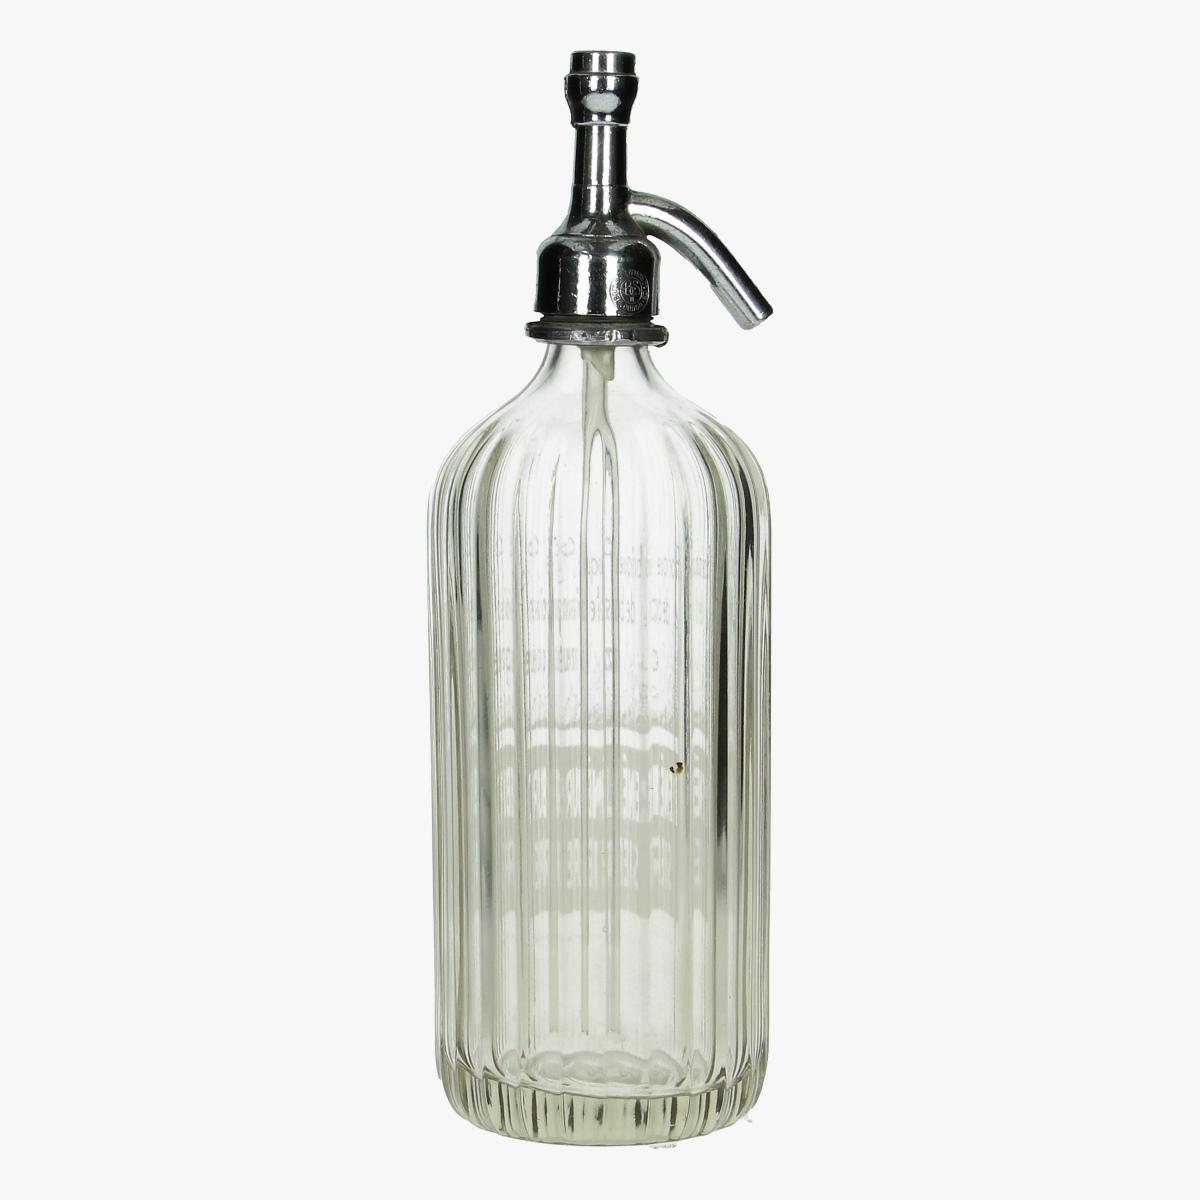 Afbeeldingen van oude soda fles fabrique de boissons gazeuses rené buro sierra